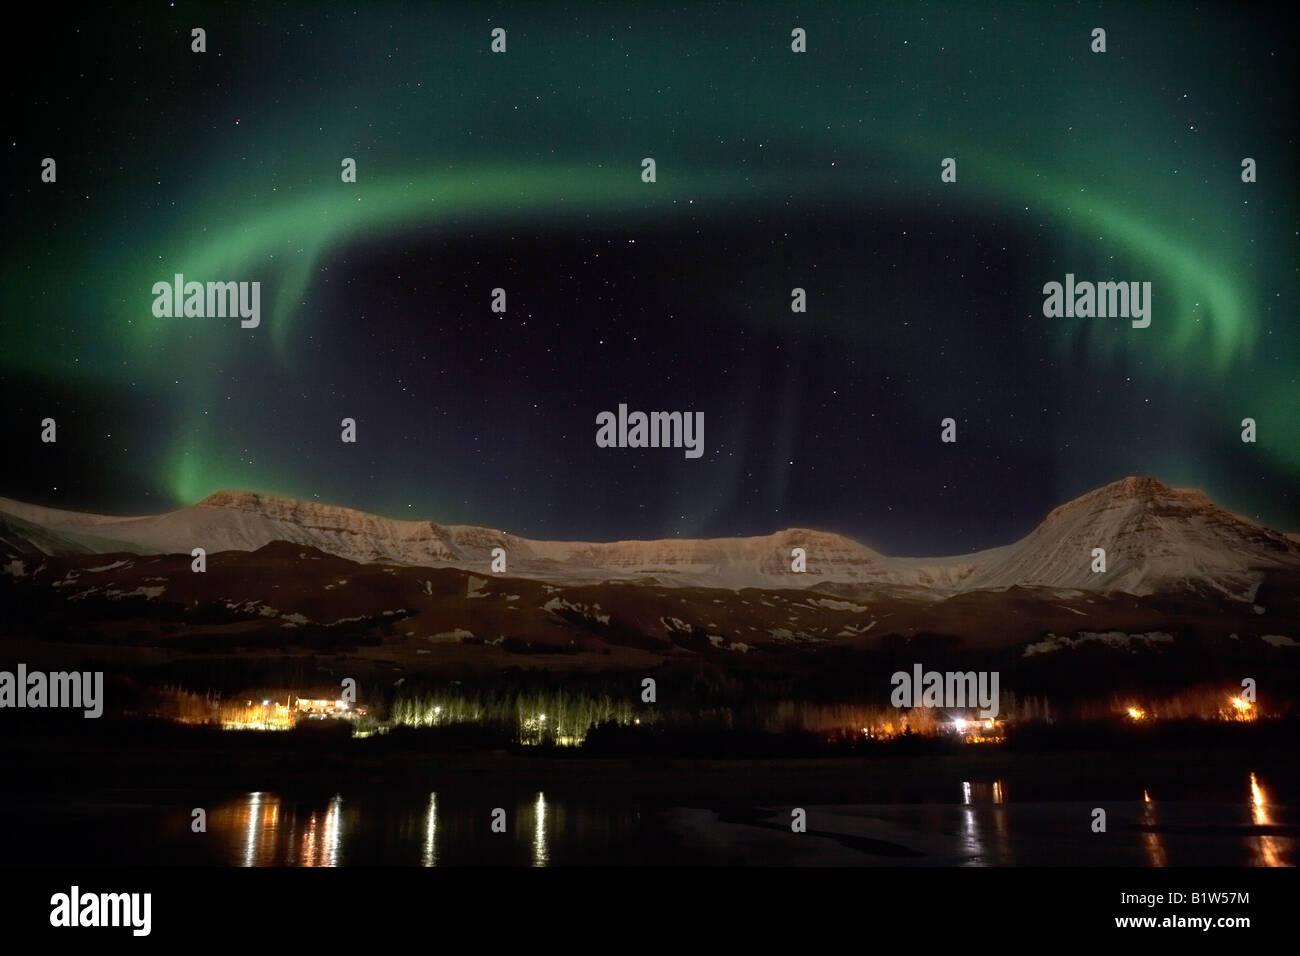 Aurora Borealis or Northern Lights over Mount Esja, Reykjavik Iceland - Stock Image